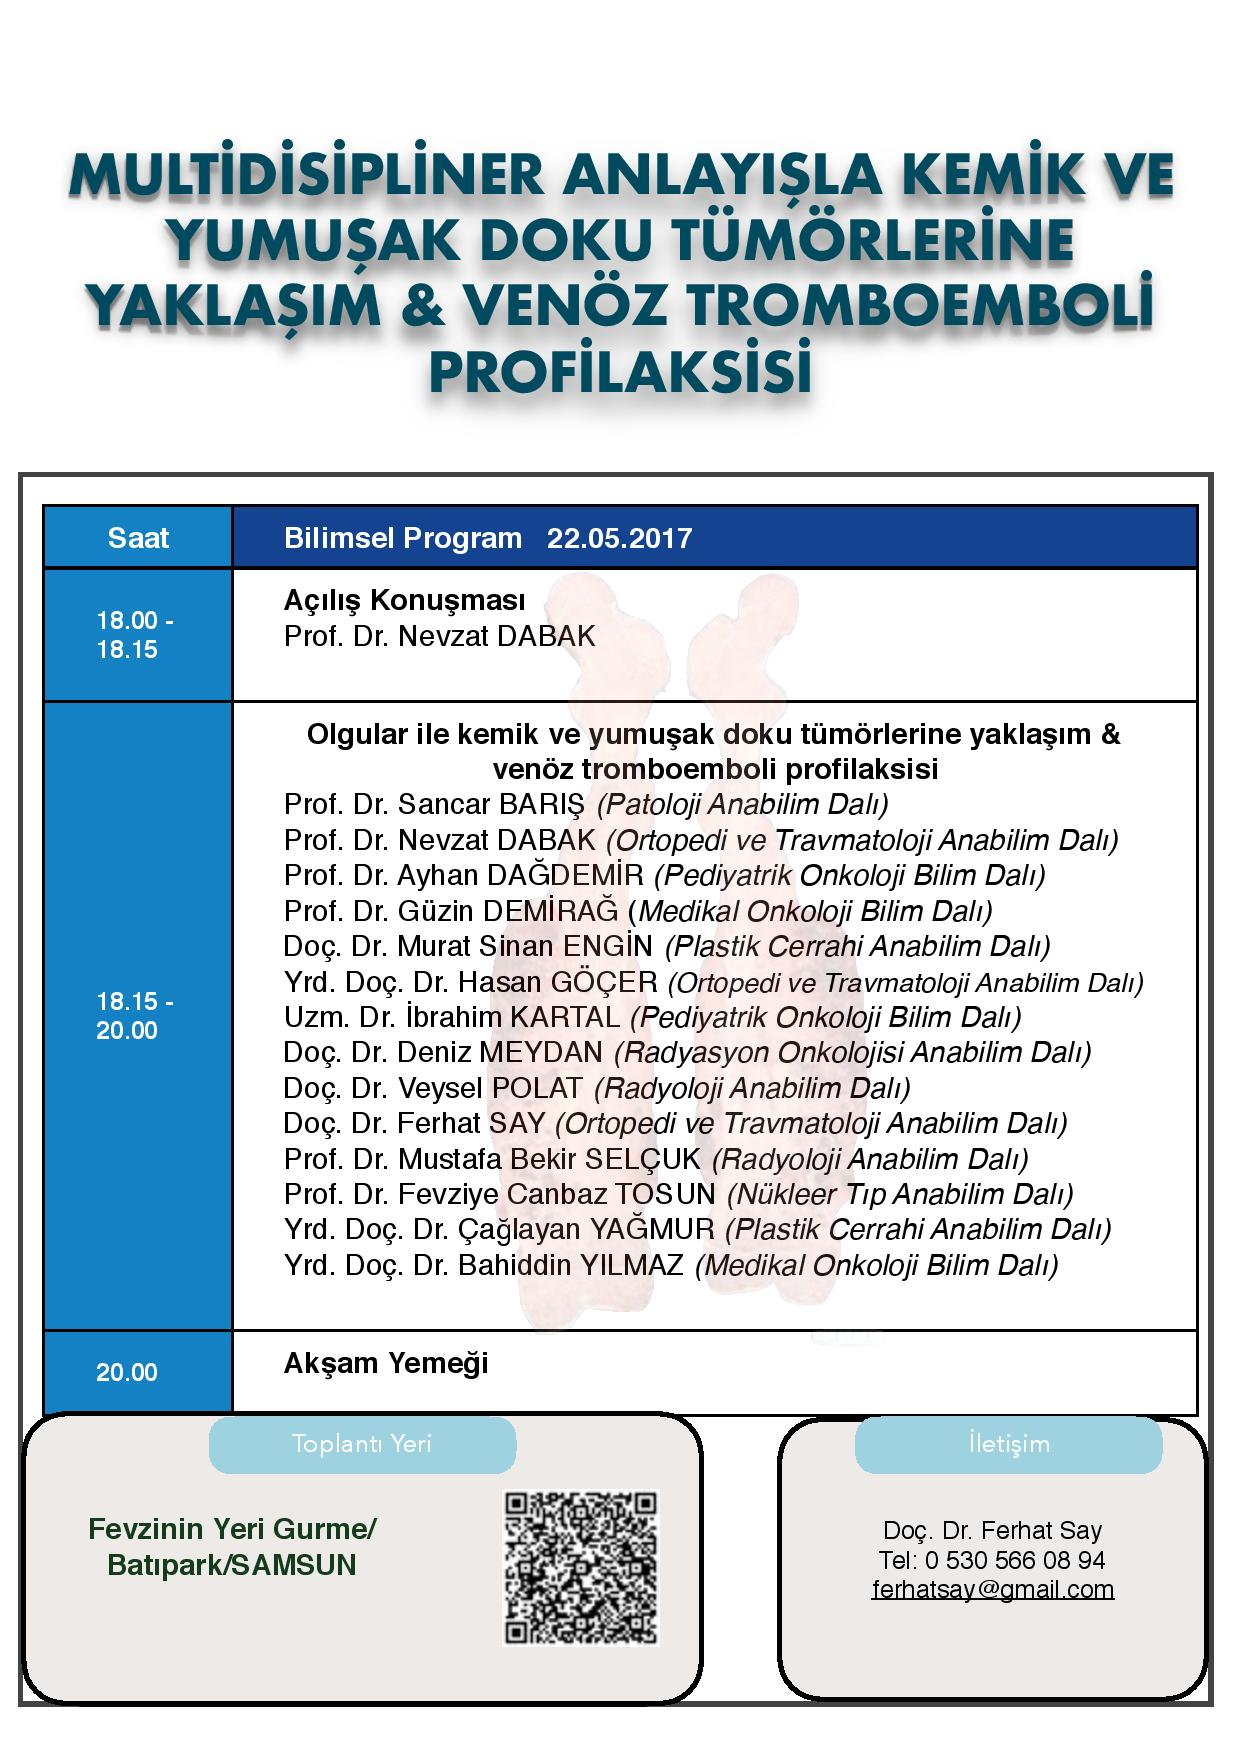 http://www.omu.edu.tr/sites/default/files/files/multidisipliner_anlayisla_kemik_ve_yumusak_doku_tumorlerine_yaklasim/program_son_kopya-page-001.jpg